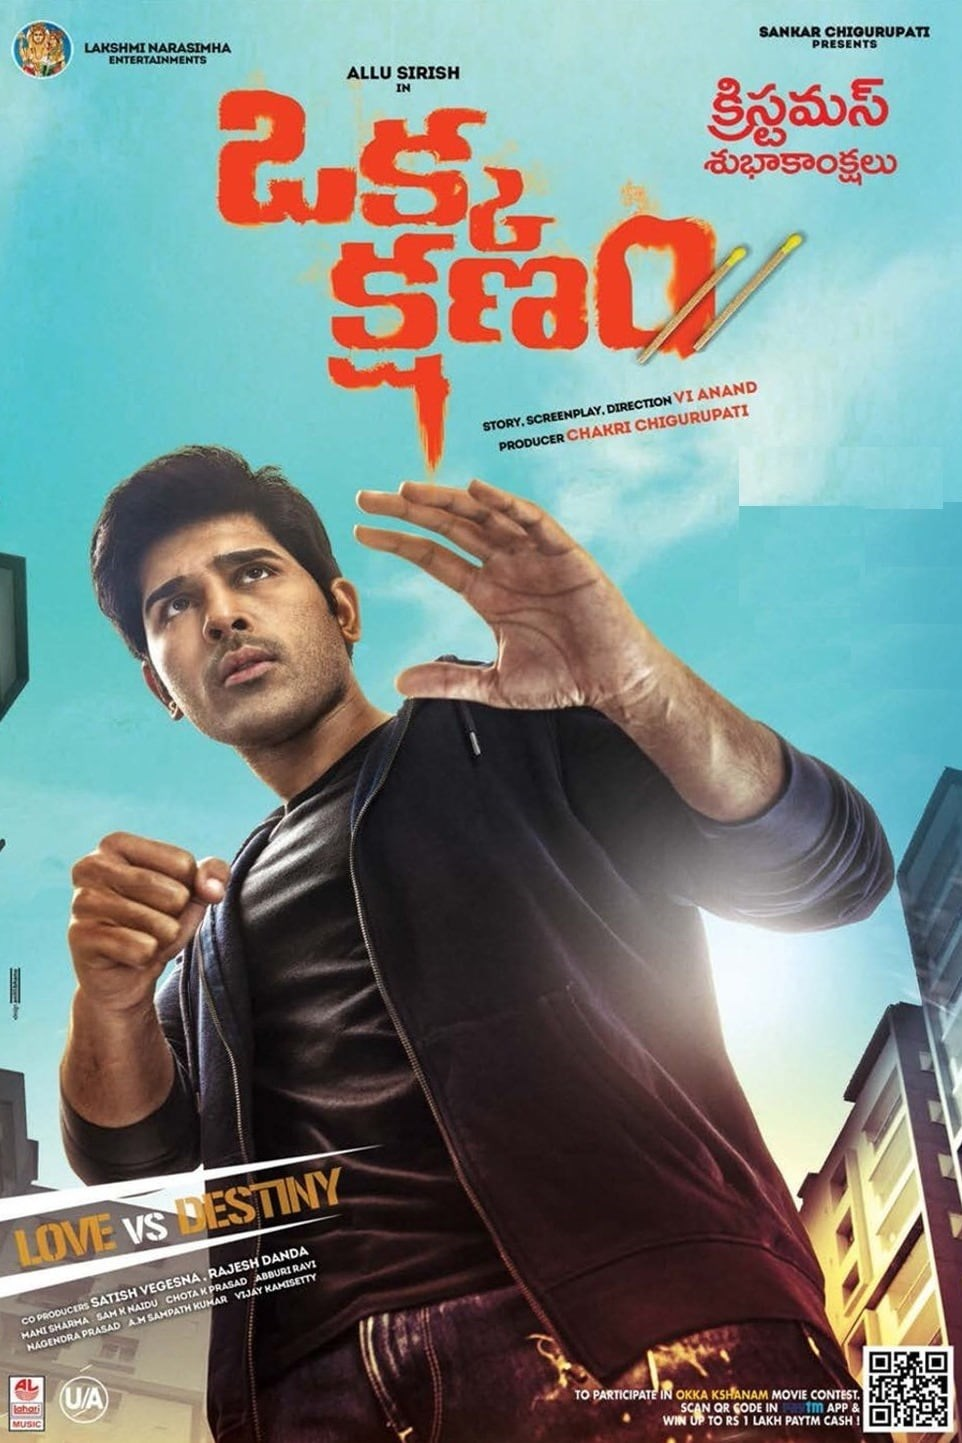 Okka Kshanam (2017) Telugu Full Movie HDRip with Bangla Subtitle || 720p-700MB || Download or Watch online now